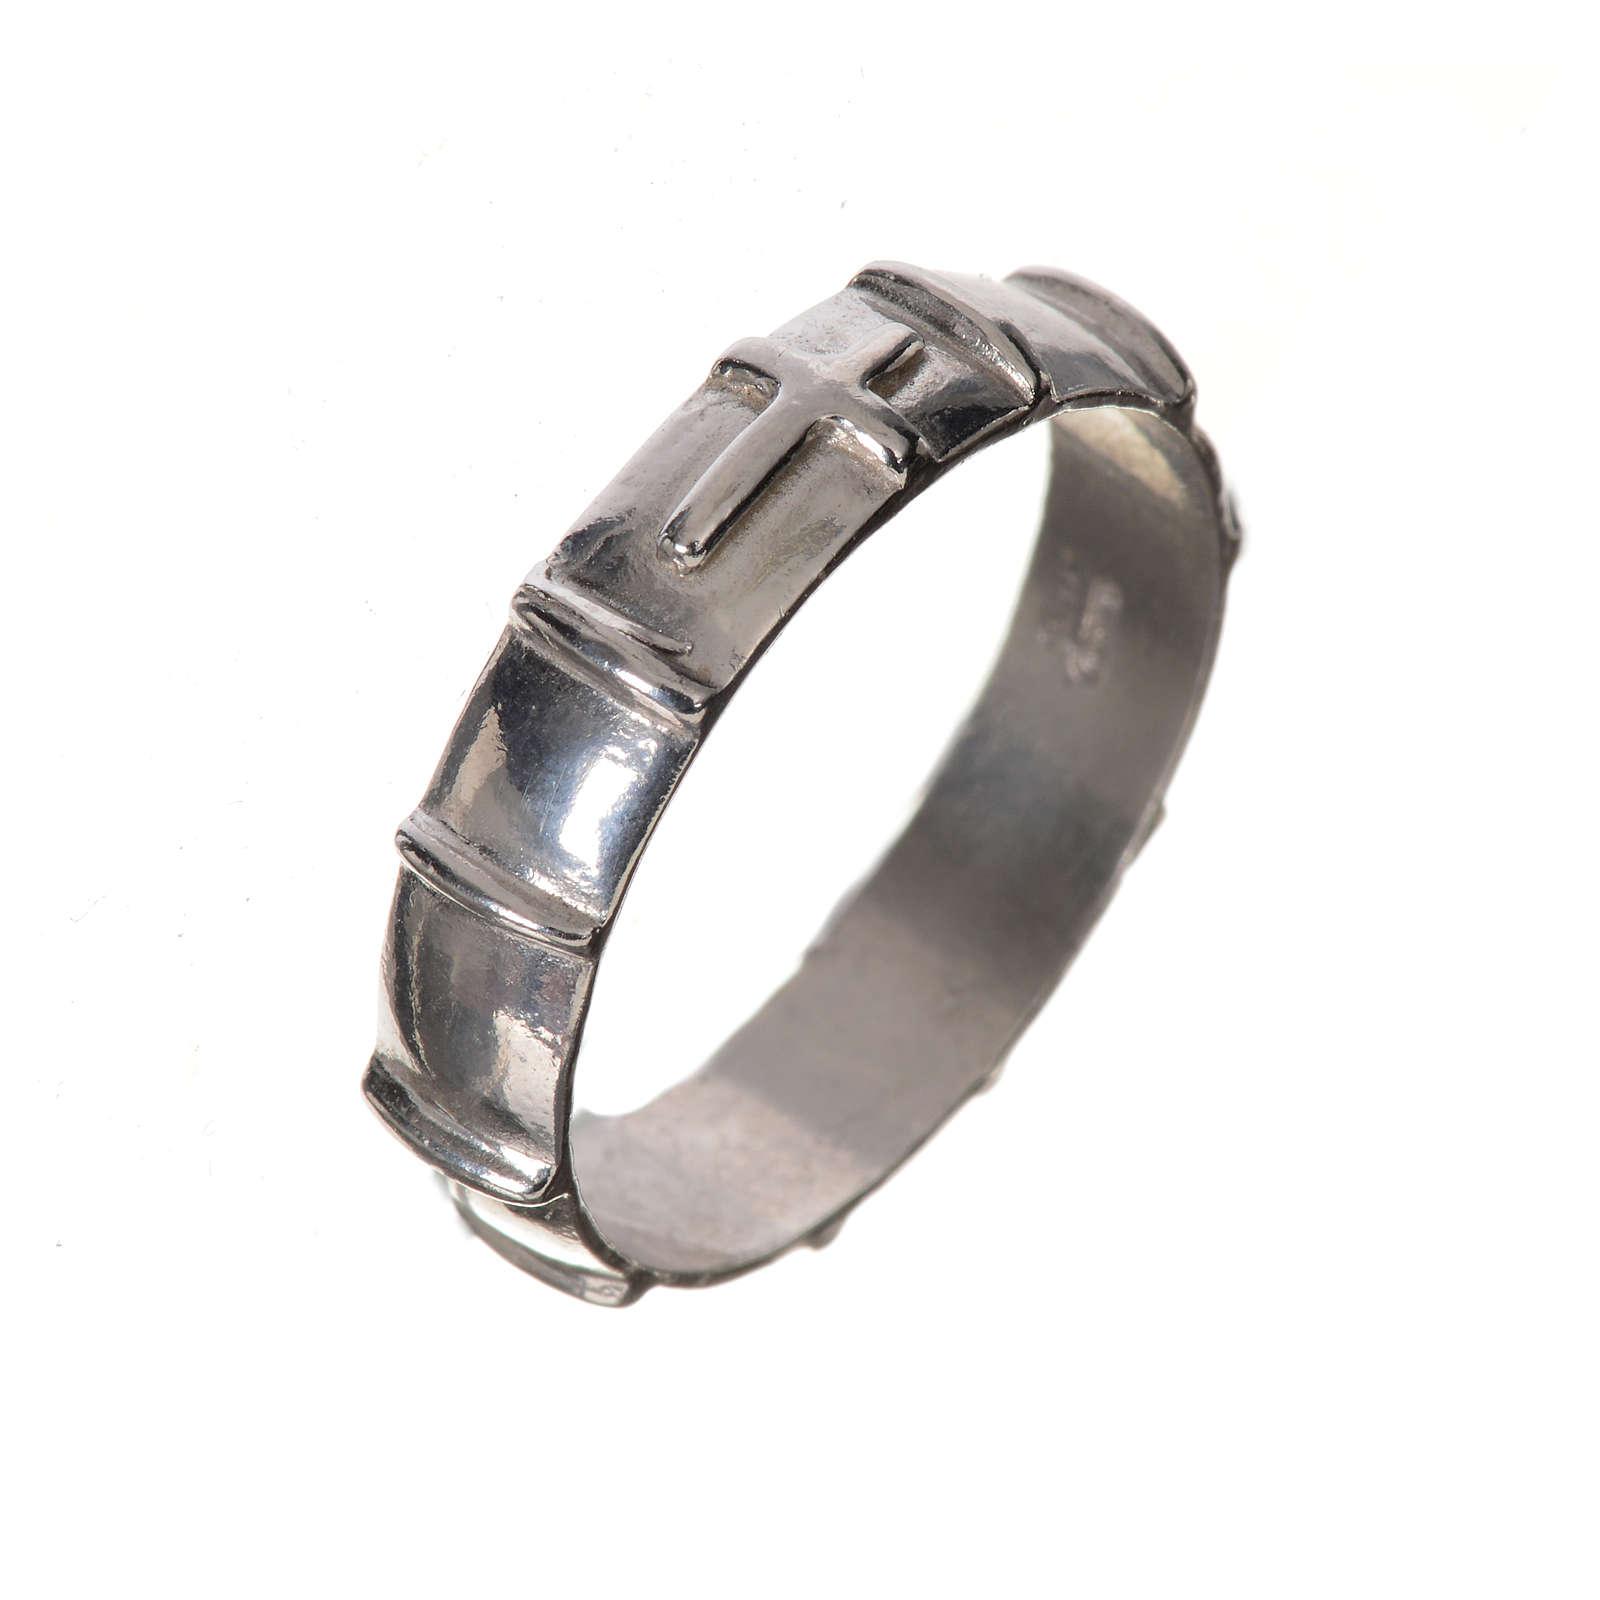 Obrączka dziesiątek różańca srebro 925 3